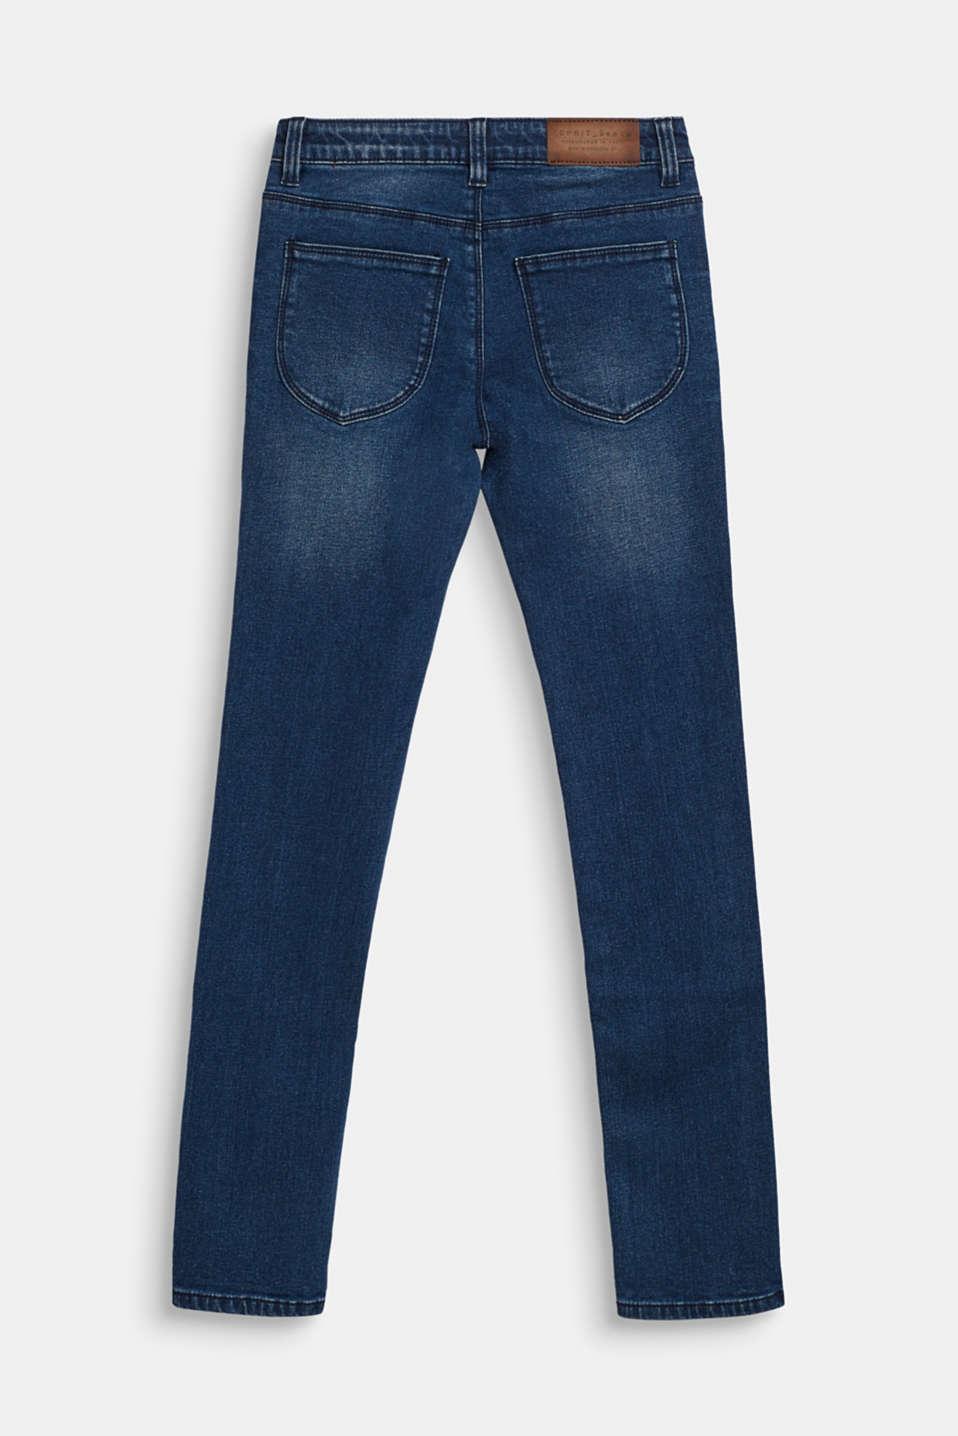 Stretch jeans with soft lining, LCDARK INDIGO DE, detail image number 1